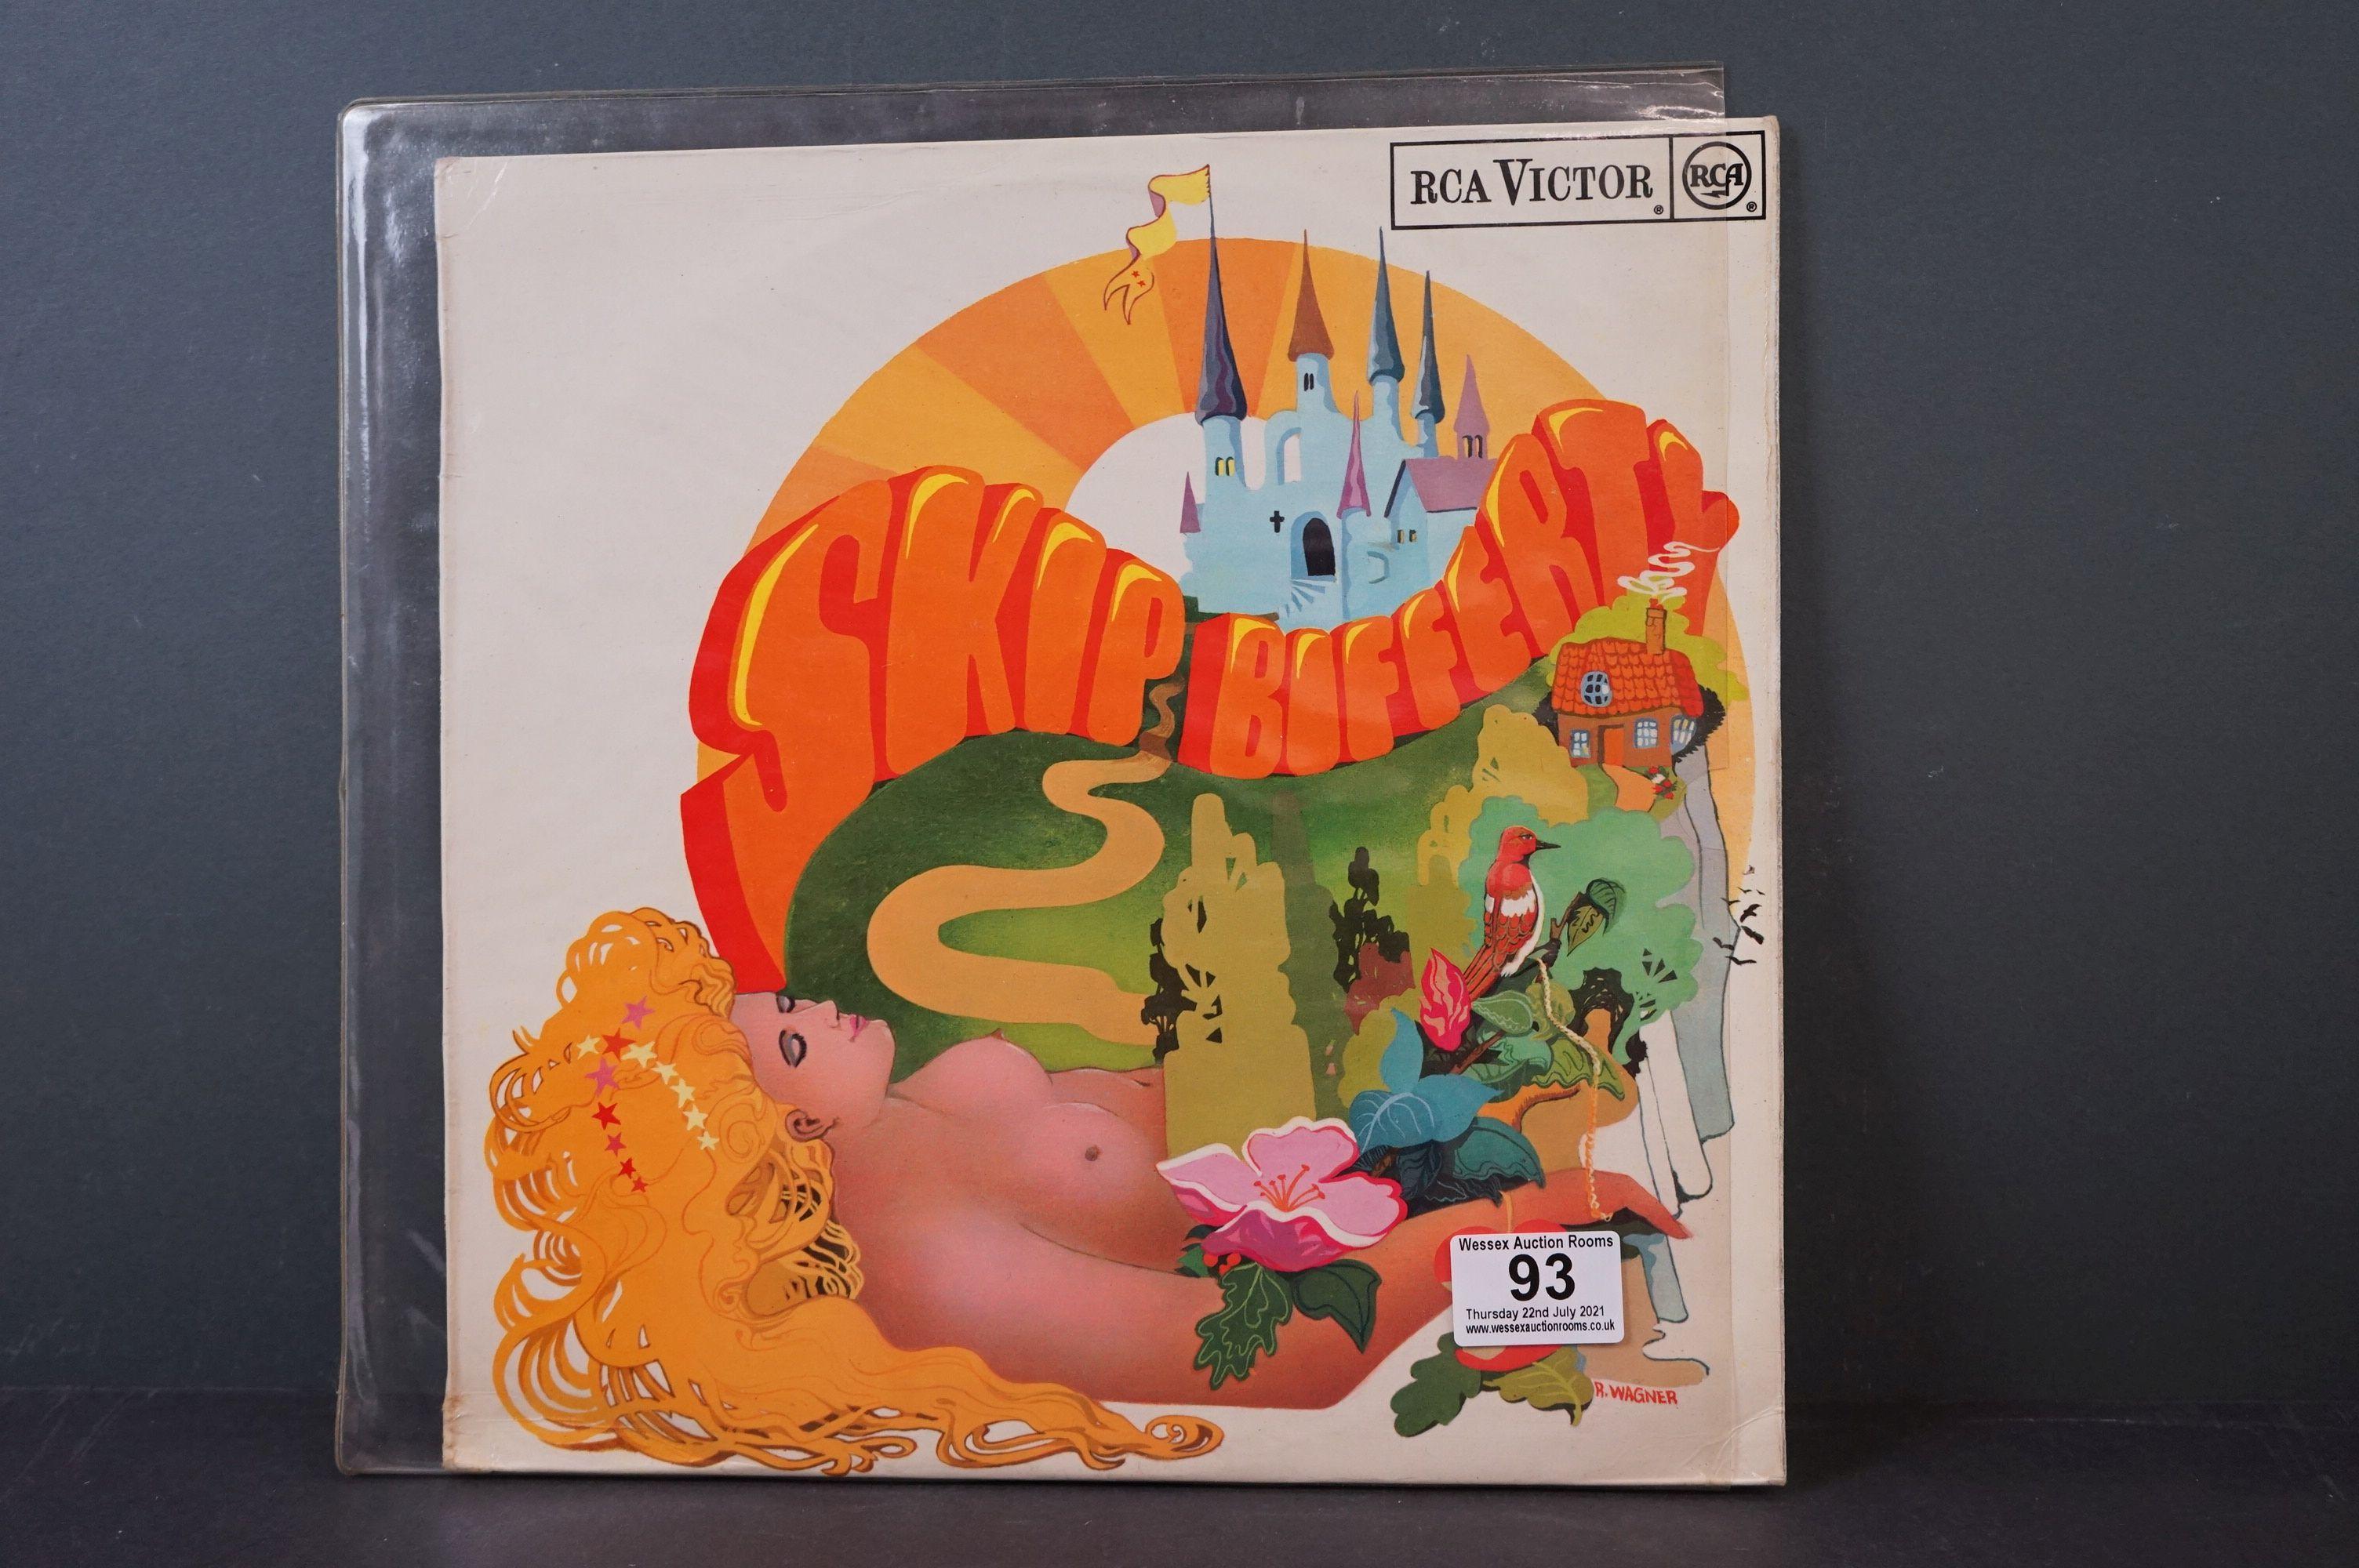 Vinyl - Psych - Skip Bifferty - Skip Bifferty (1968 UK, RCA Records, Orange labels, Stereo Copy) vg+